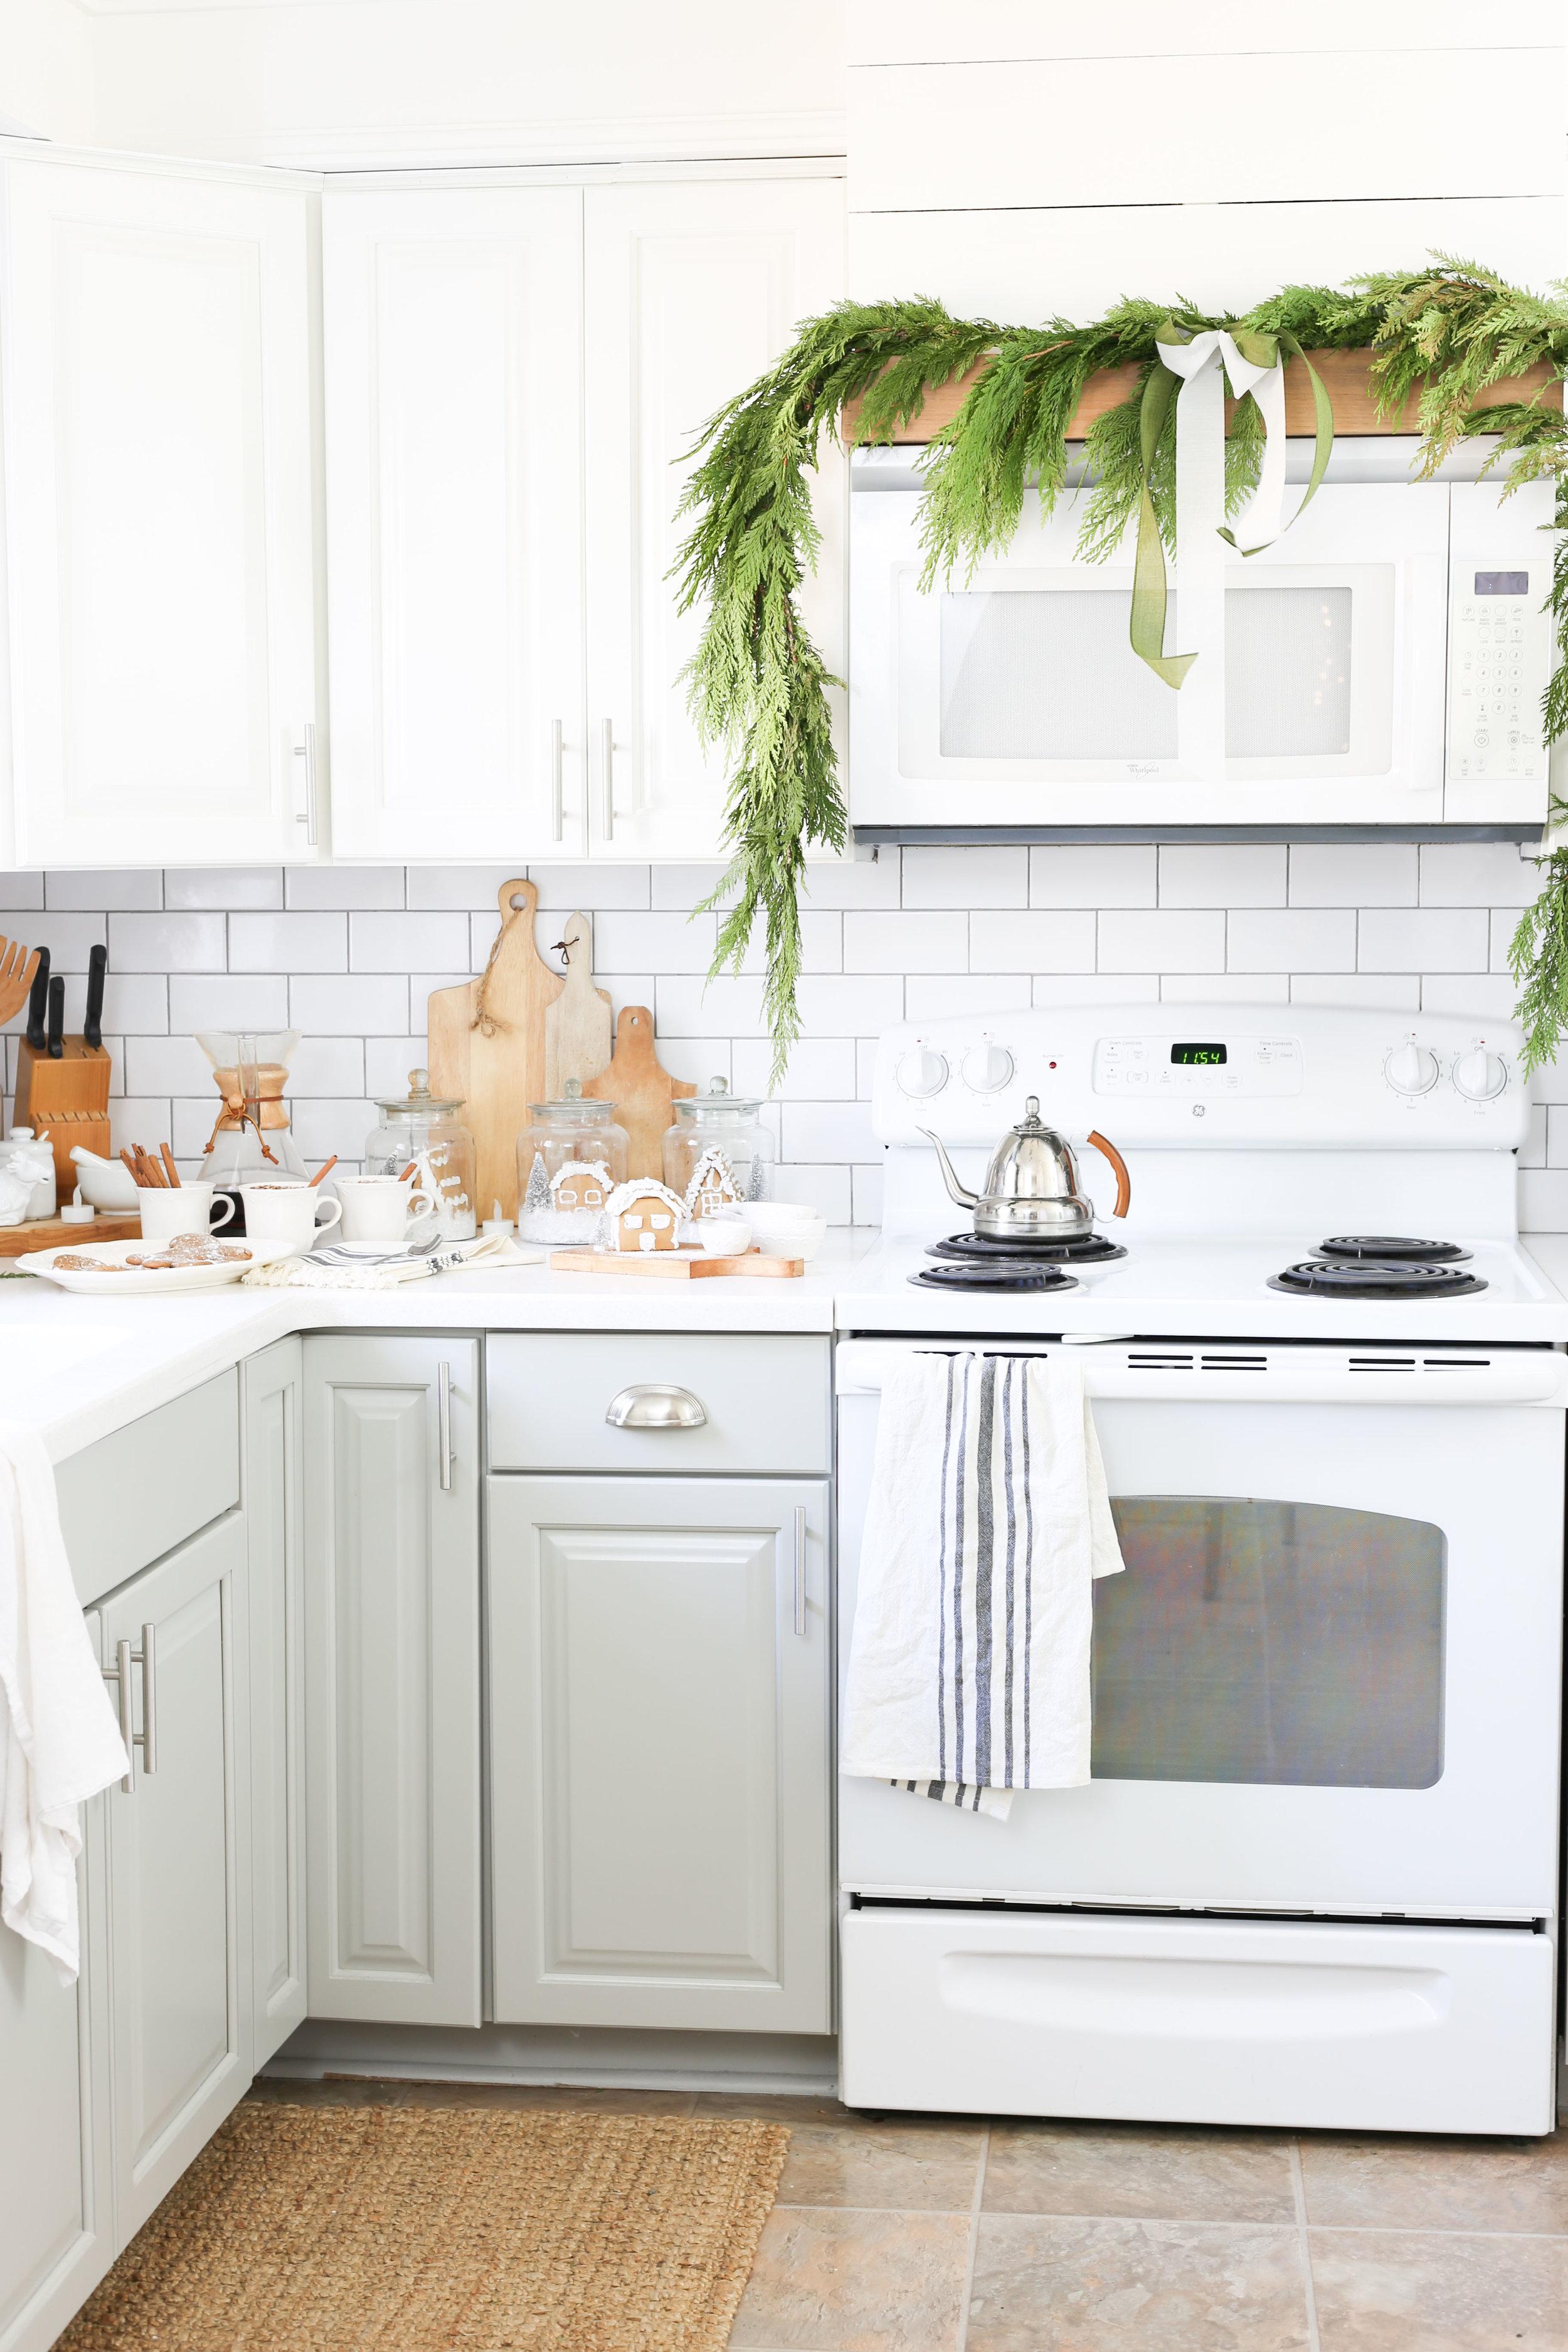 Christmas 2017 Home Tour: Deck The Blogs-Kitchen Christmas Decor with Live Cedar Garland and Gingerbread Houses- Plum Pretty Decor & Design's Christmas Home Tour